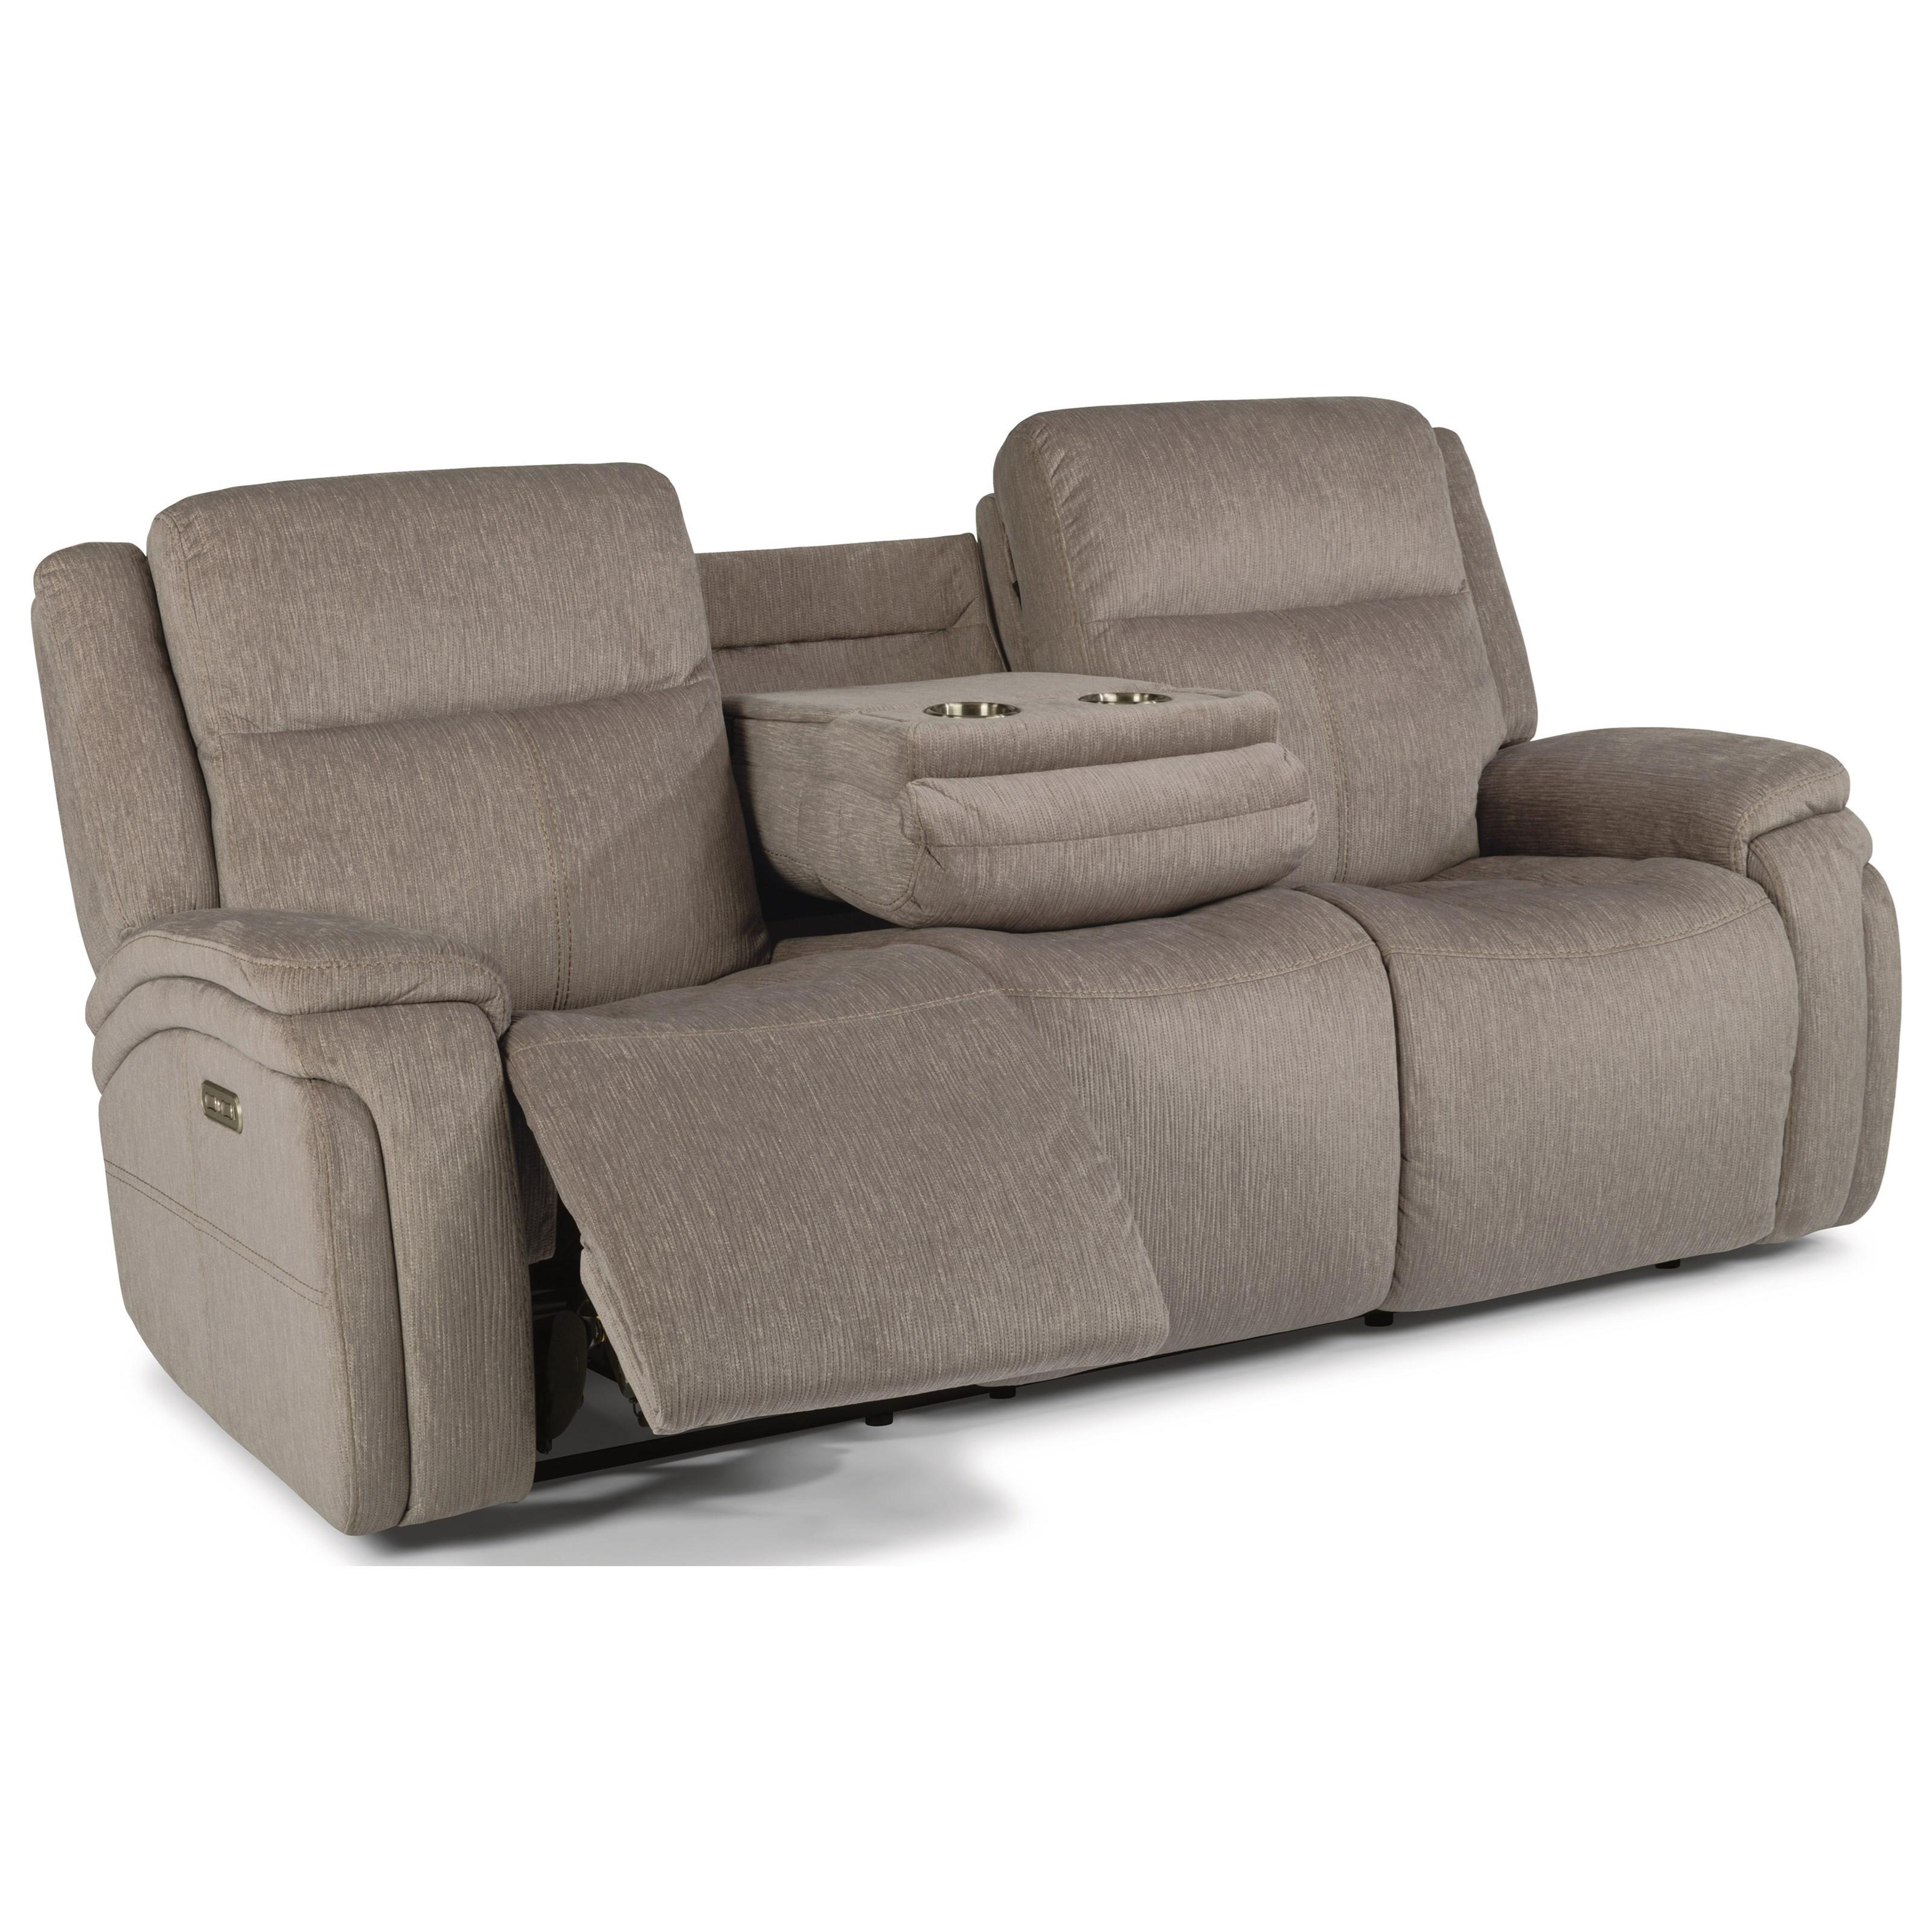 flexsteel reclining sofa warranty wing sleeper latitudes rocket contemporary power